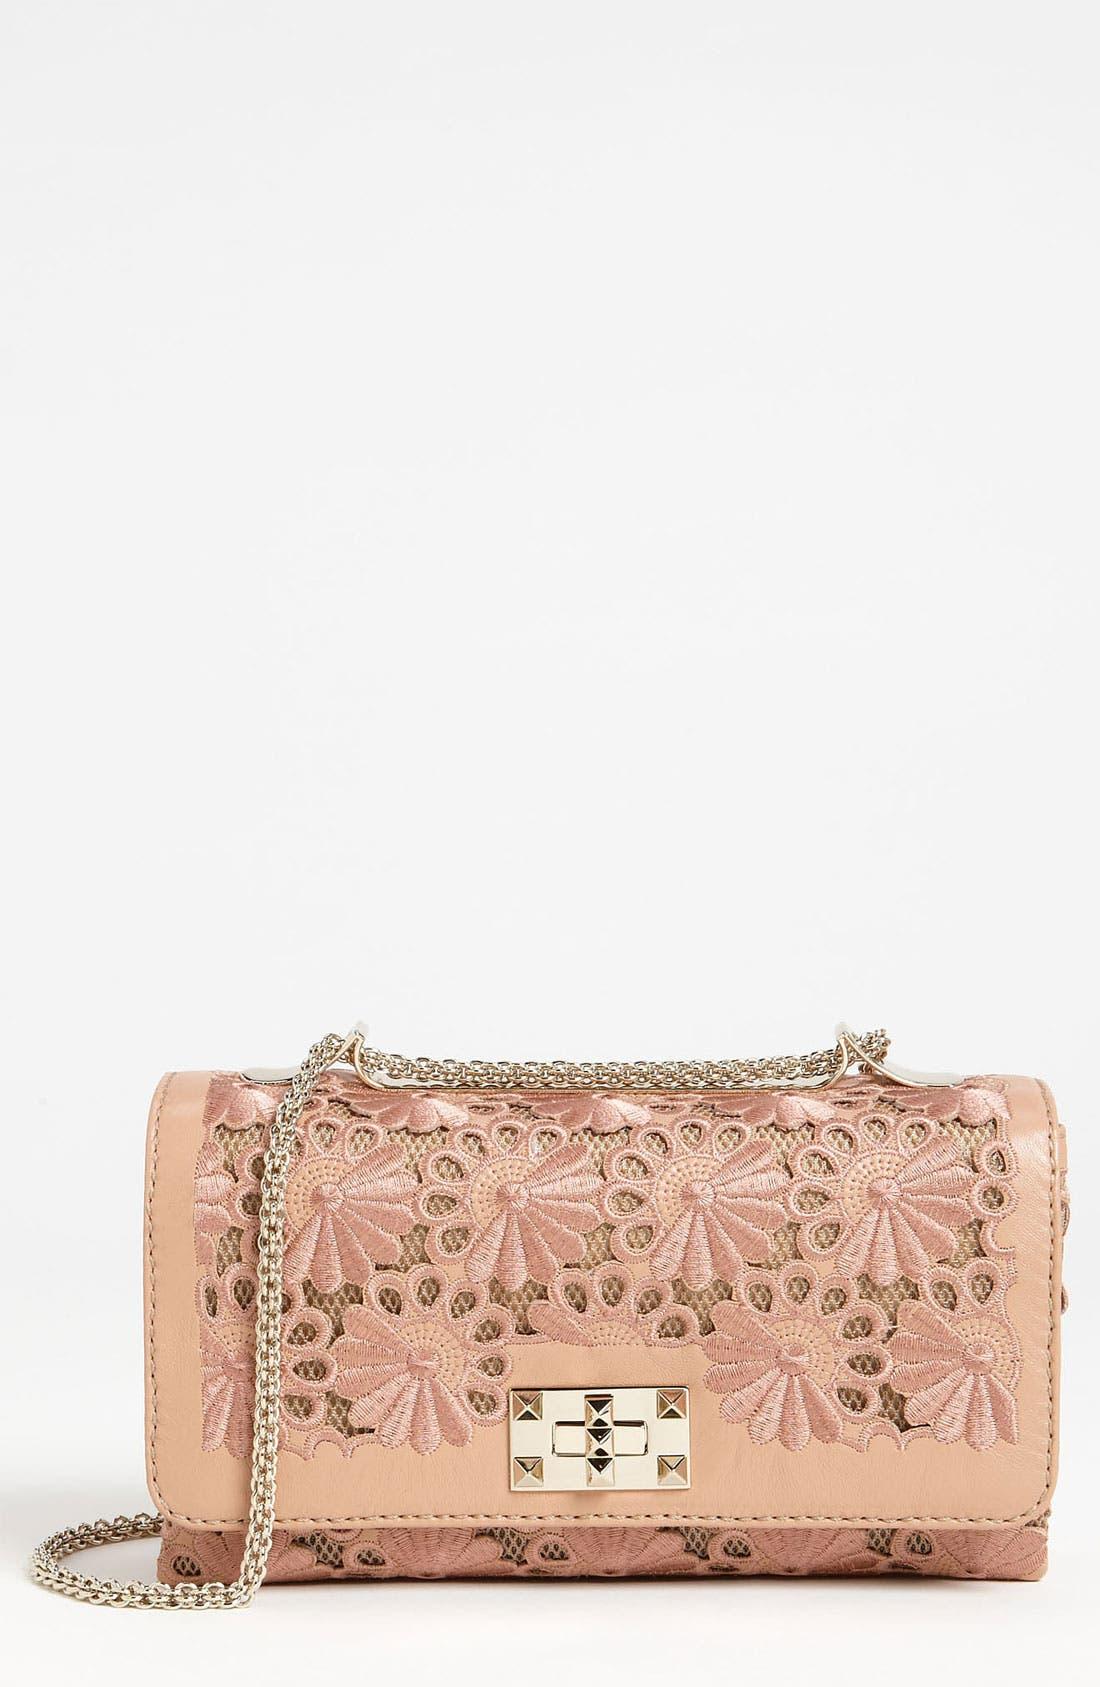 Main Image - Valentino 'Small' Lace Bag